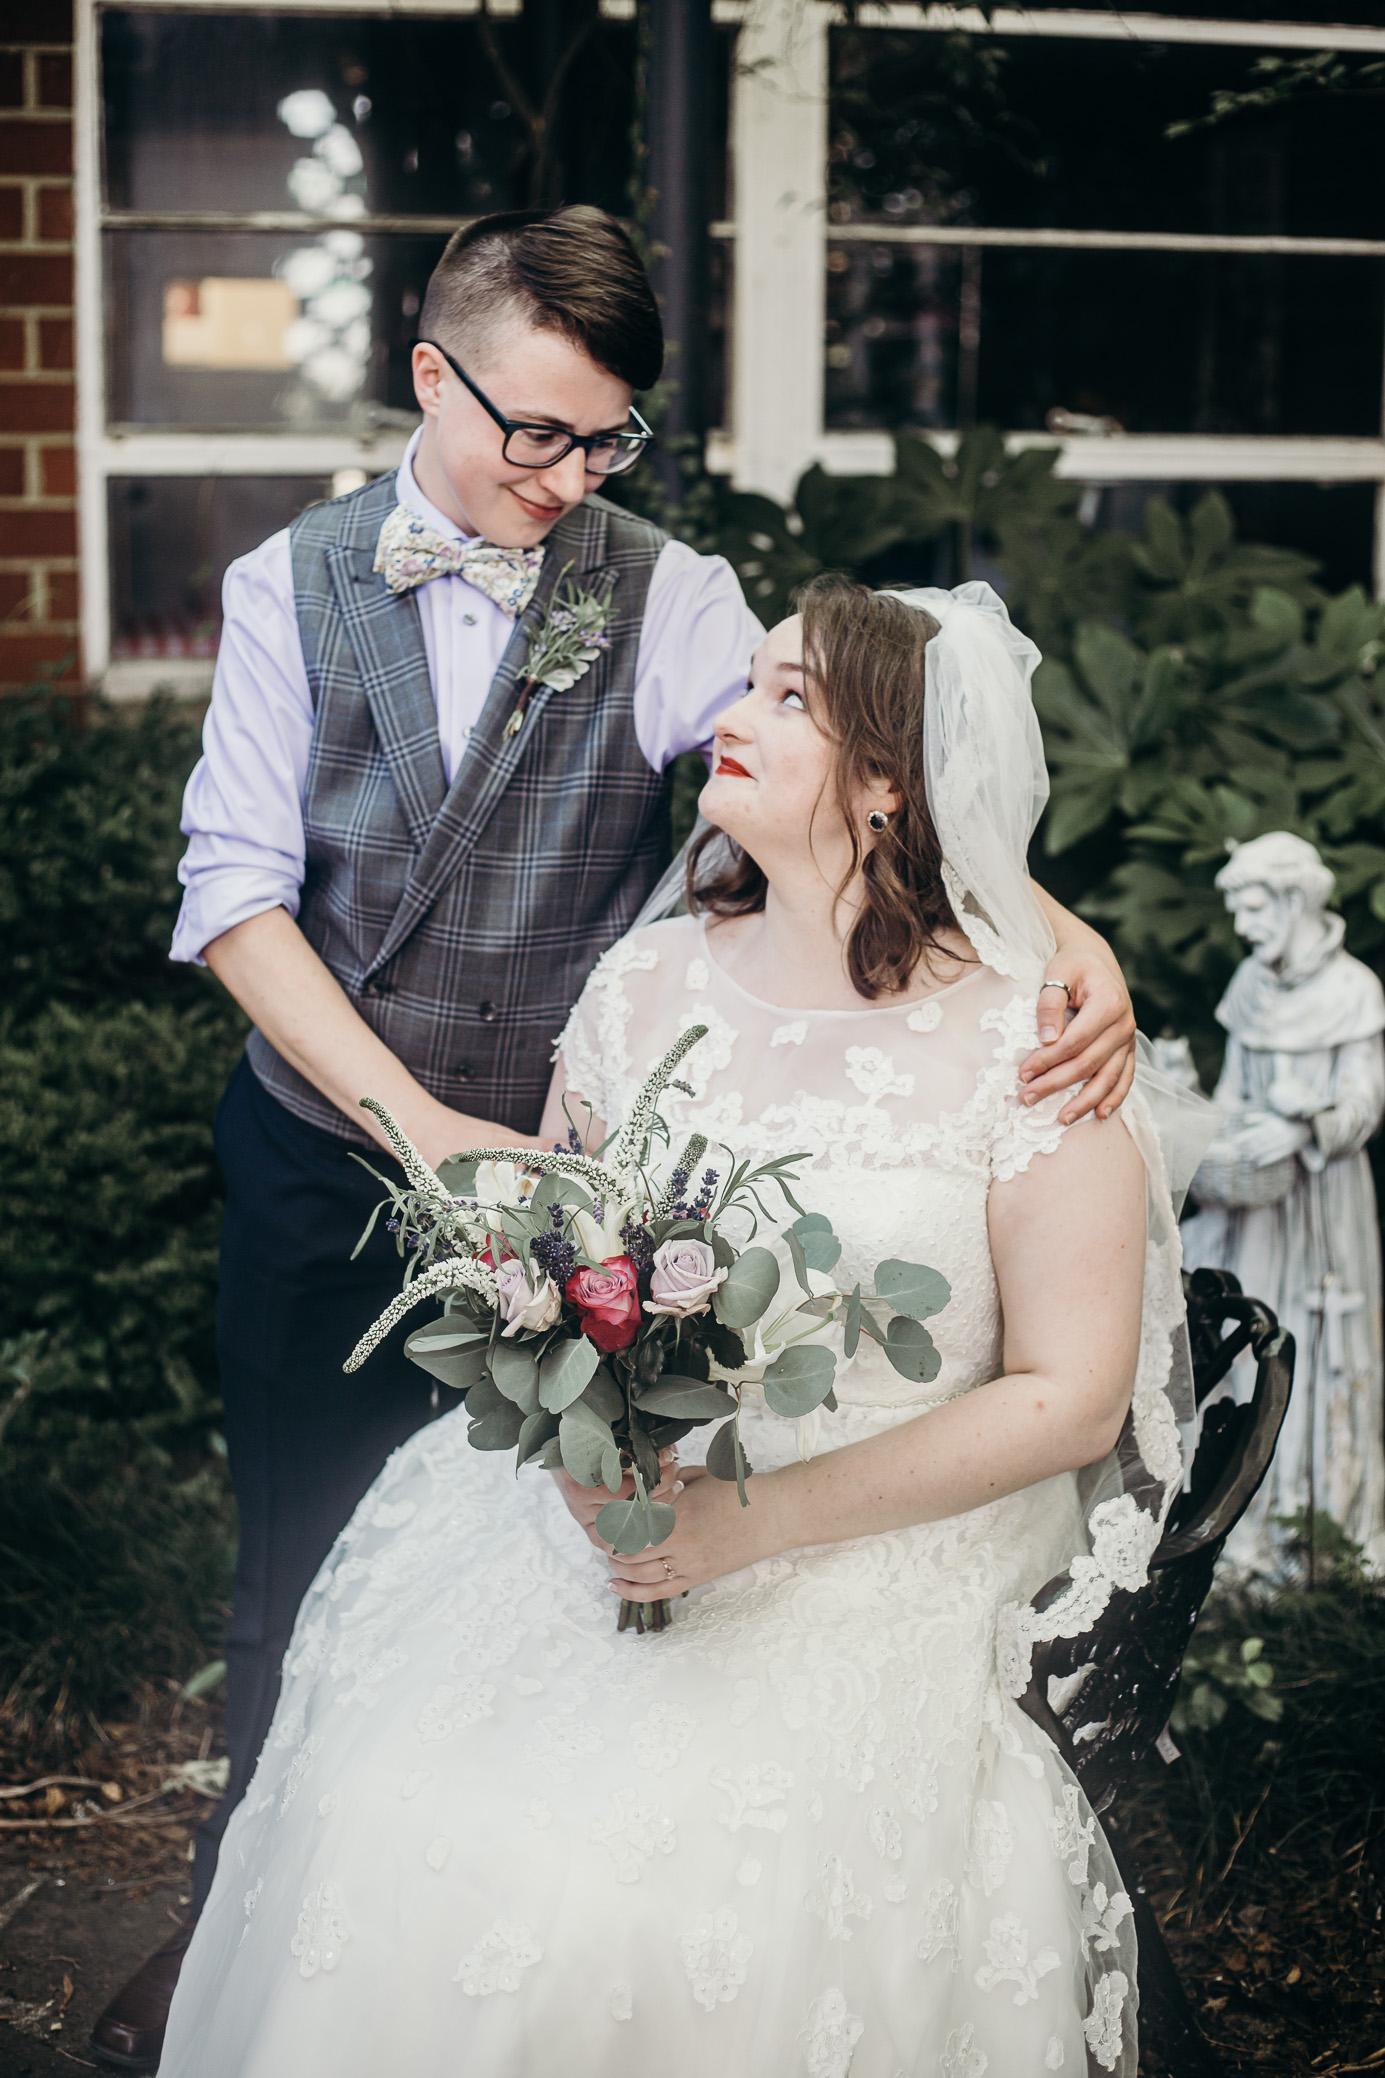 Los Angeles California wedding photography by David A. Smith of DSmithImages Wedding Photography, Portraits, and Events, a wedding photographer in Birmingham, Alabama